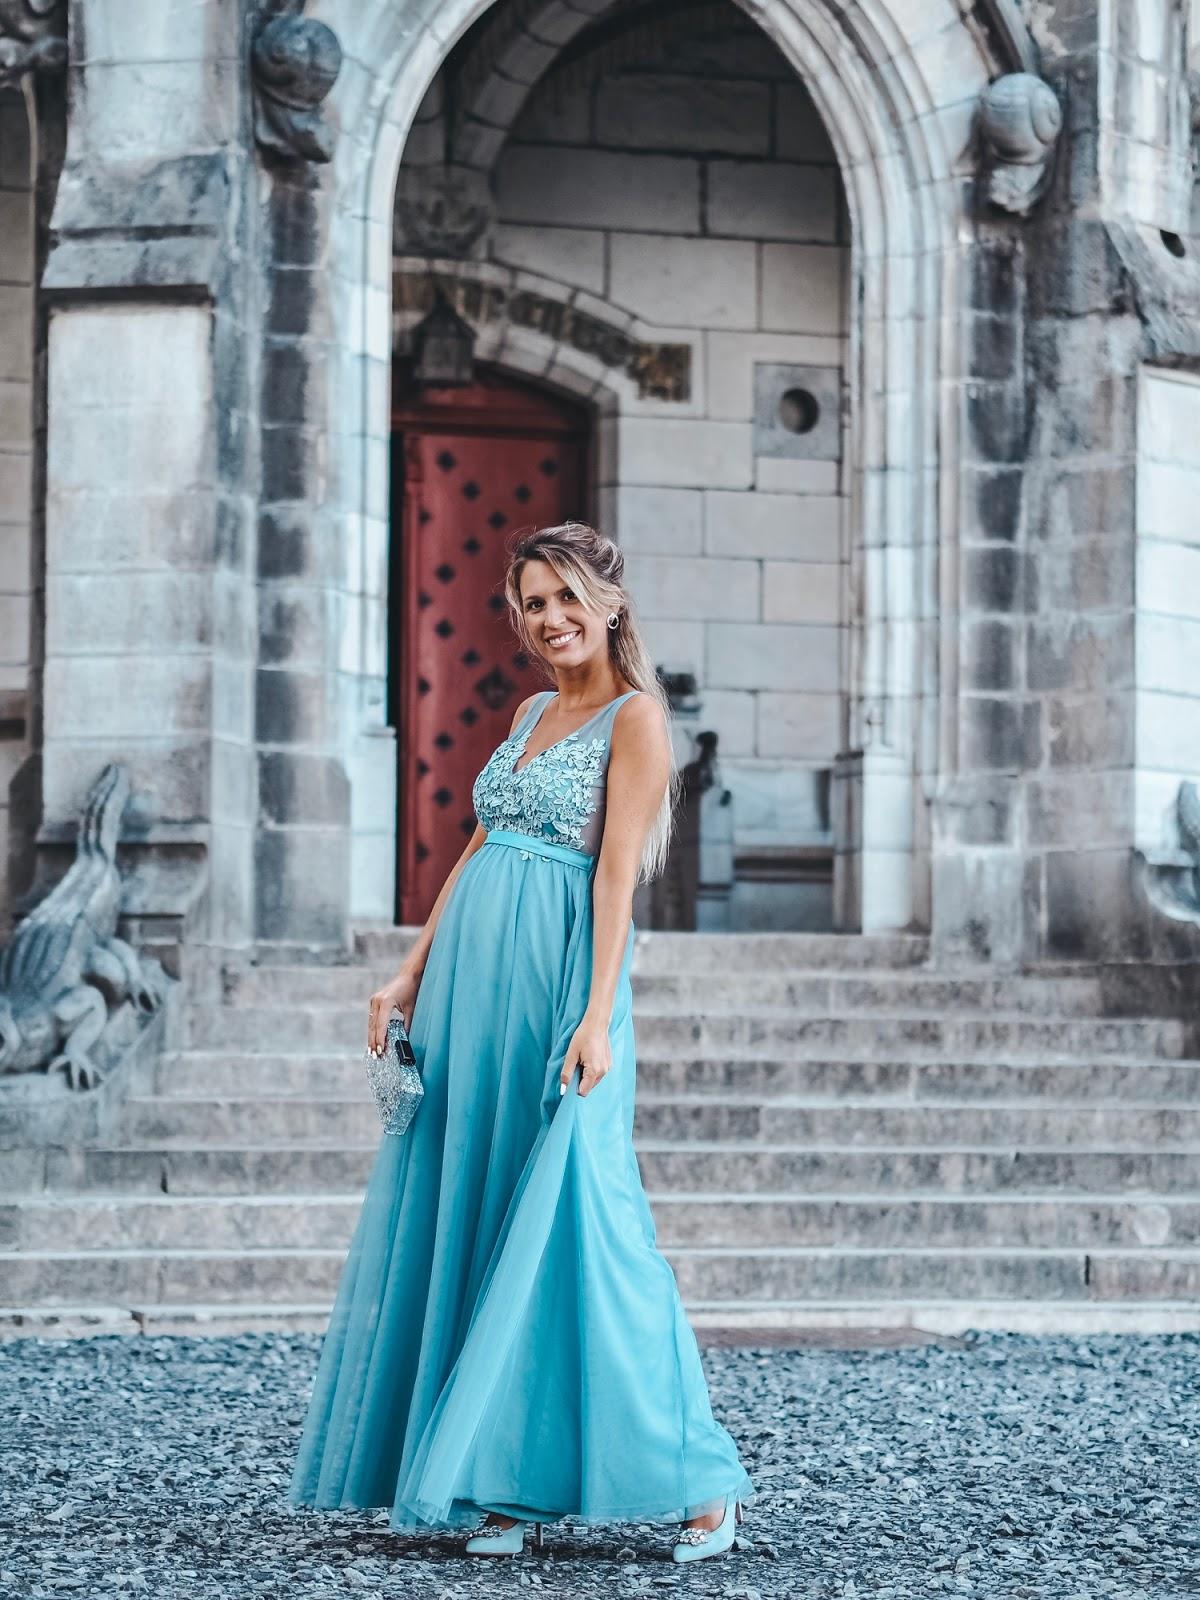 invitada boda embarazada 2019